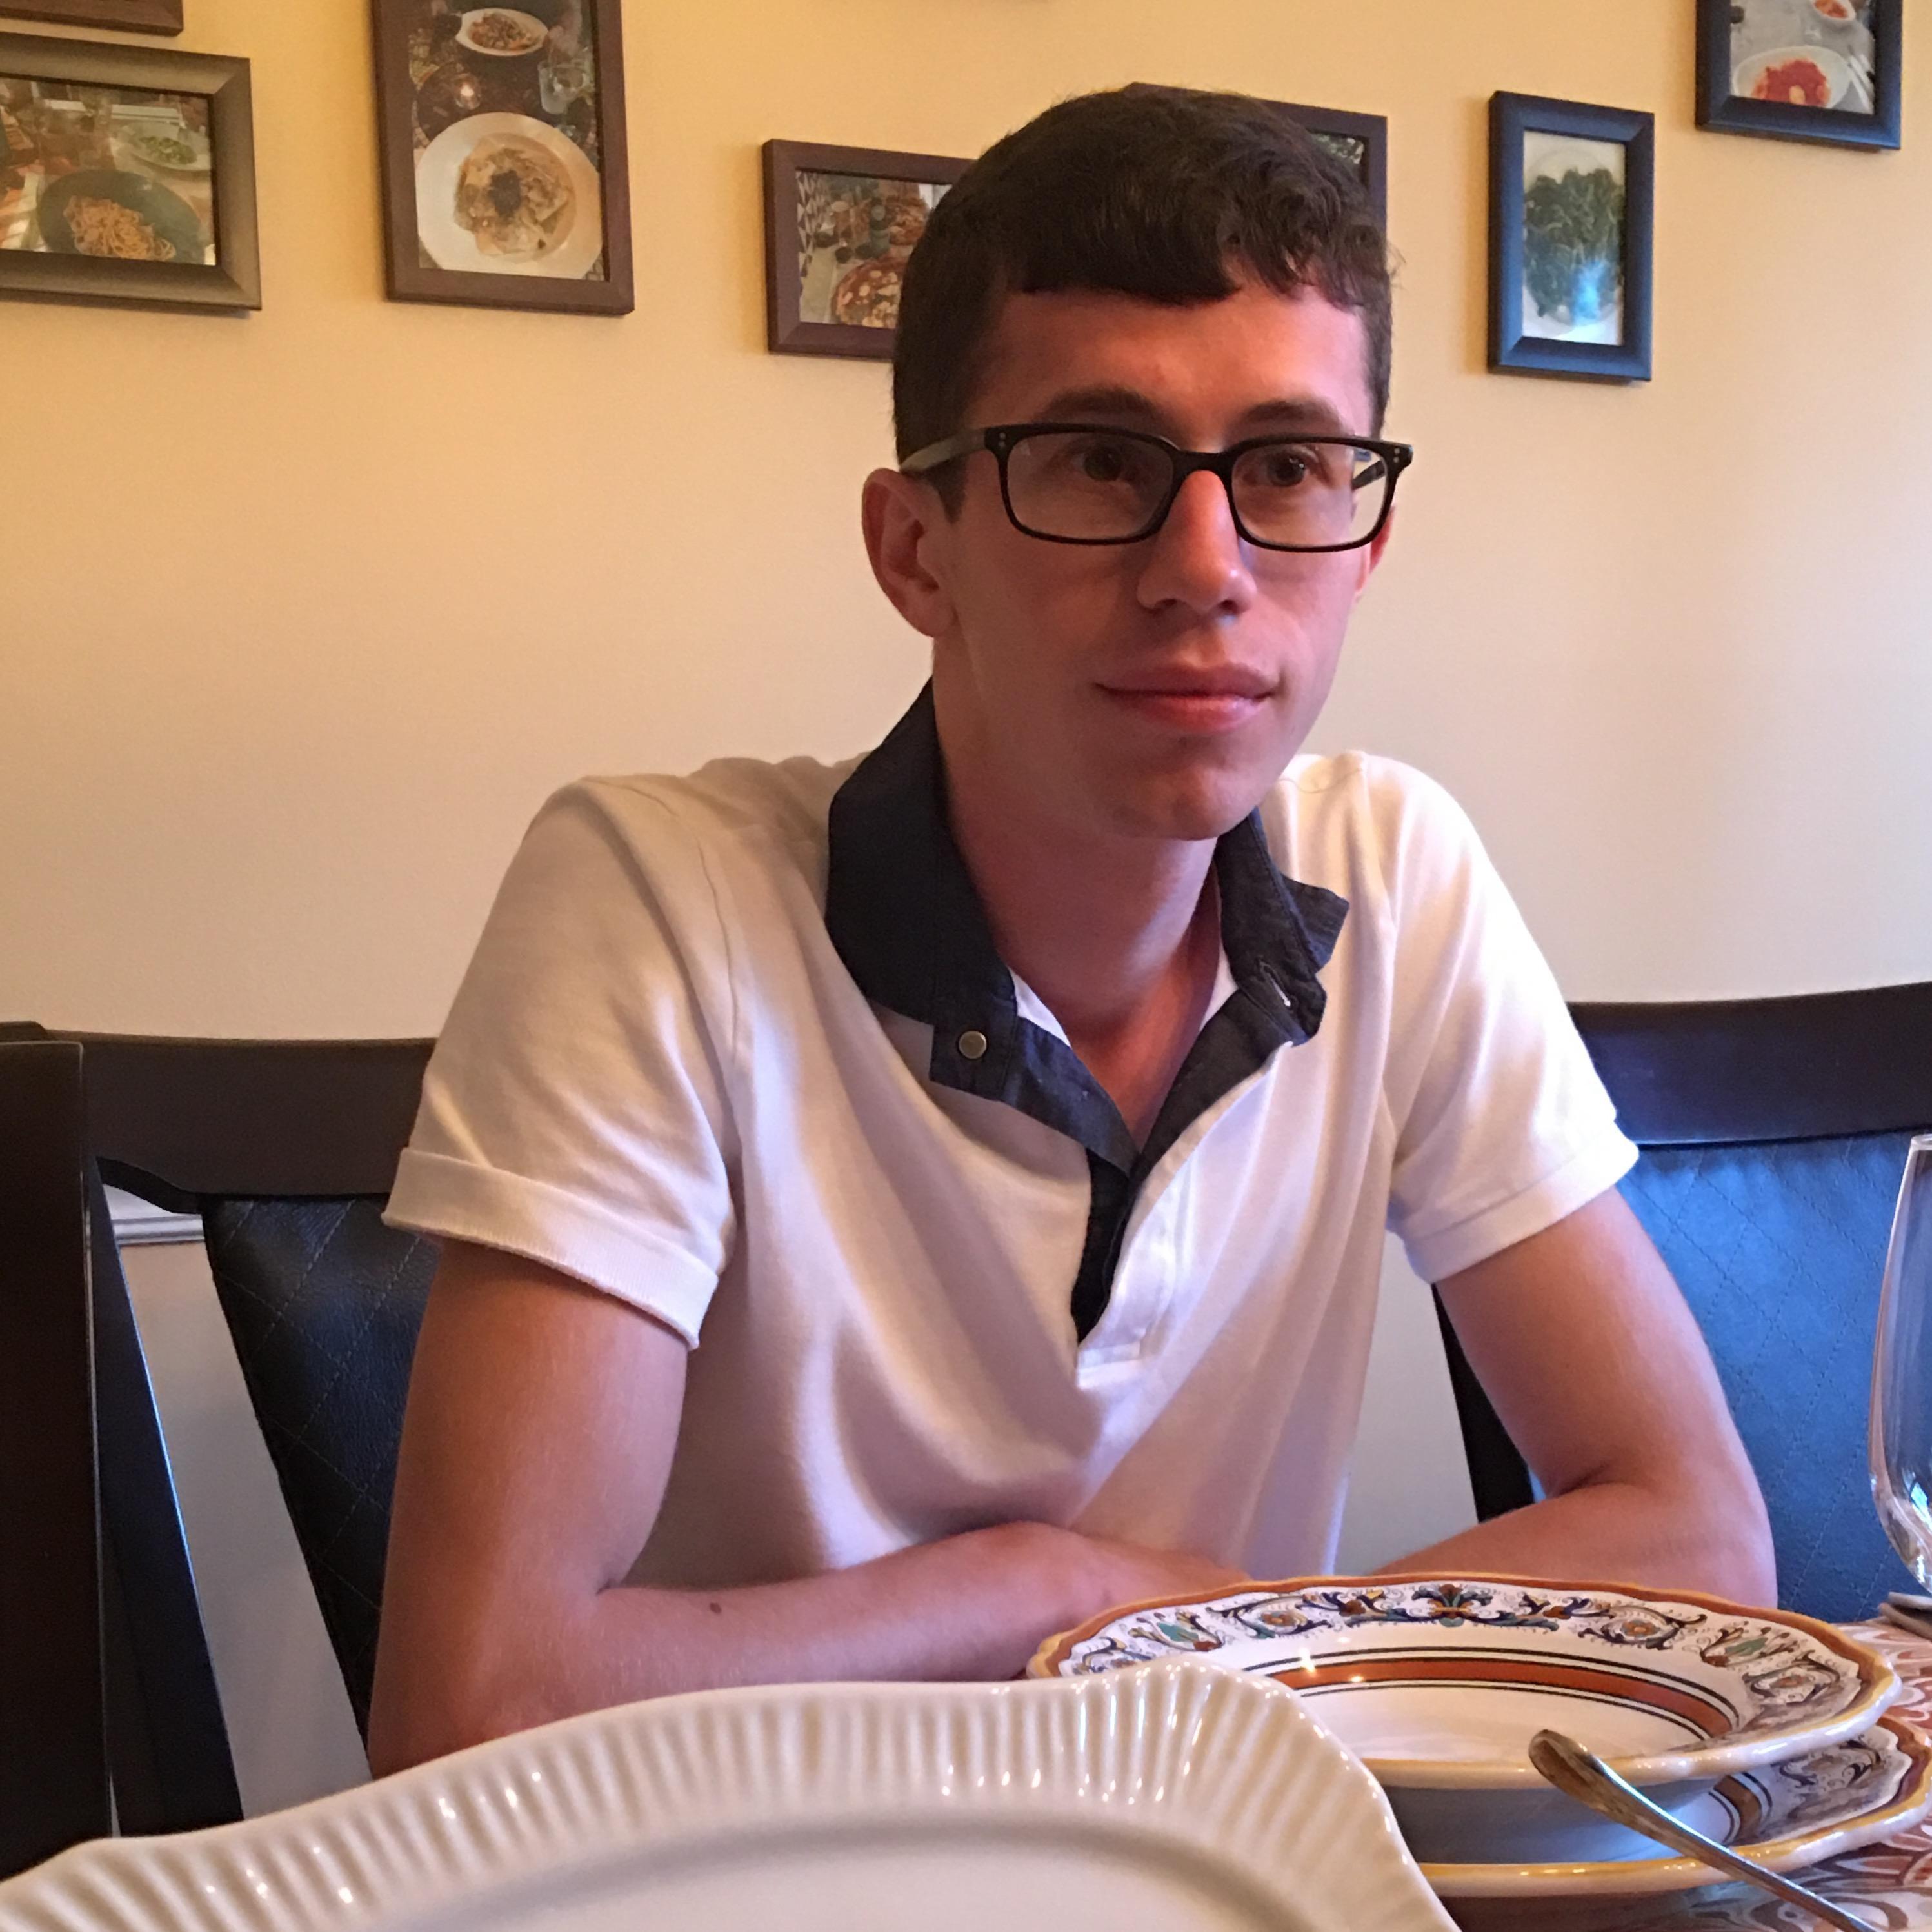 house sitter Ryan